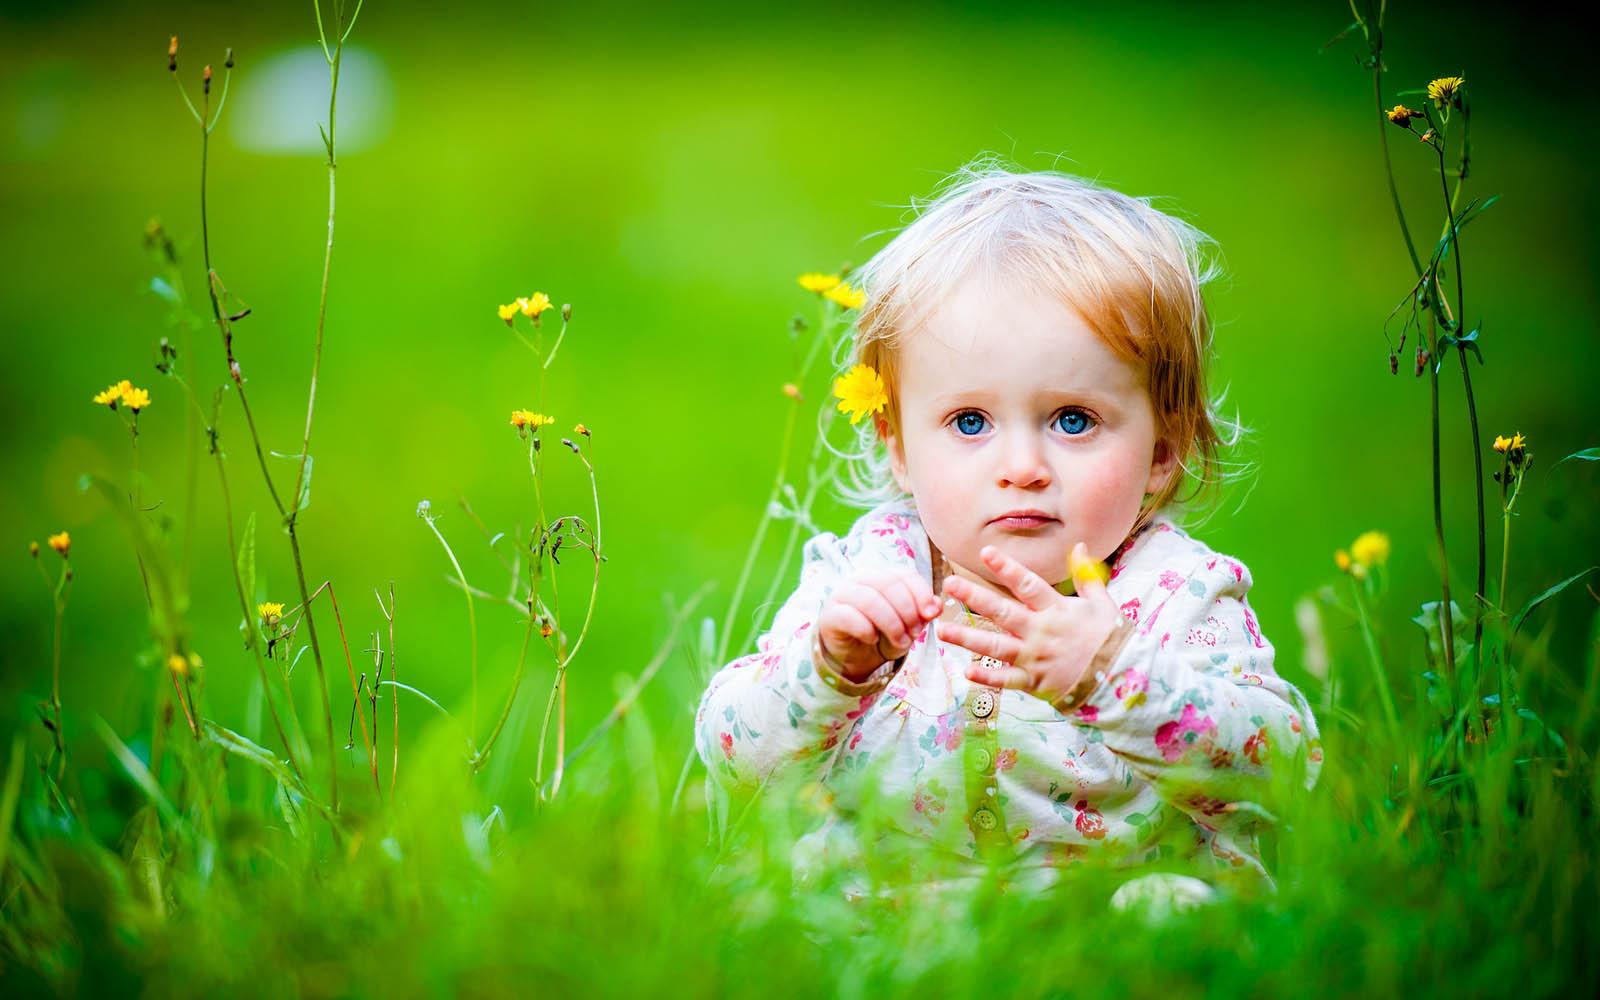 Baby Girl Wallpapers:wallpapers Screensavers